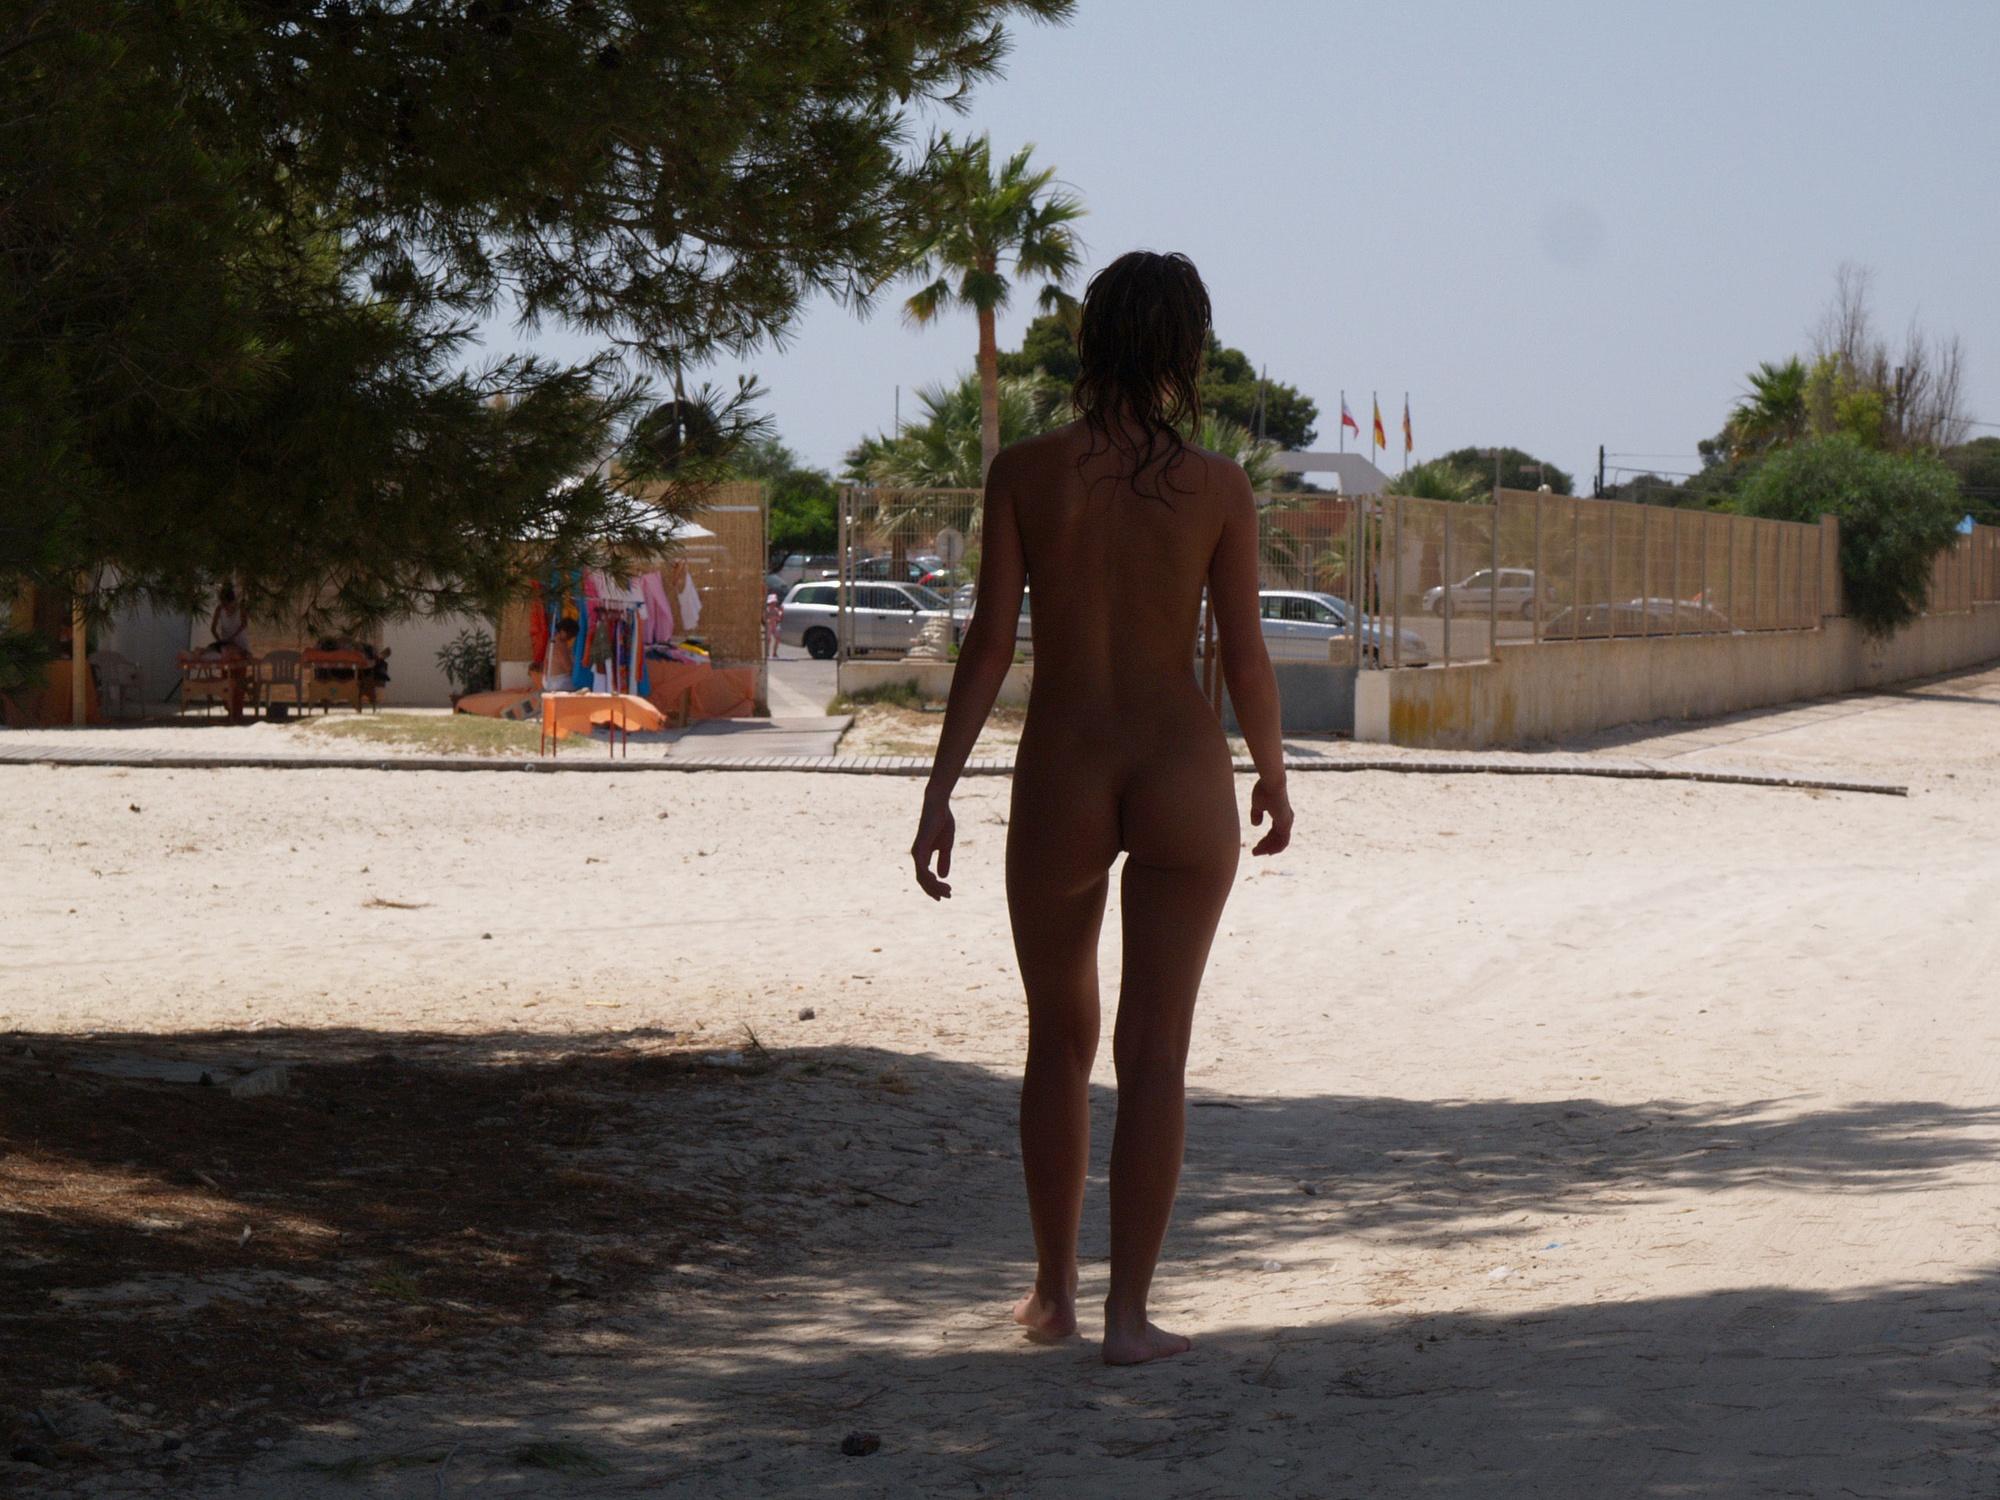 On a public beach naomi meeting lexo - 3 part 5